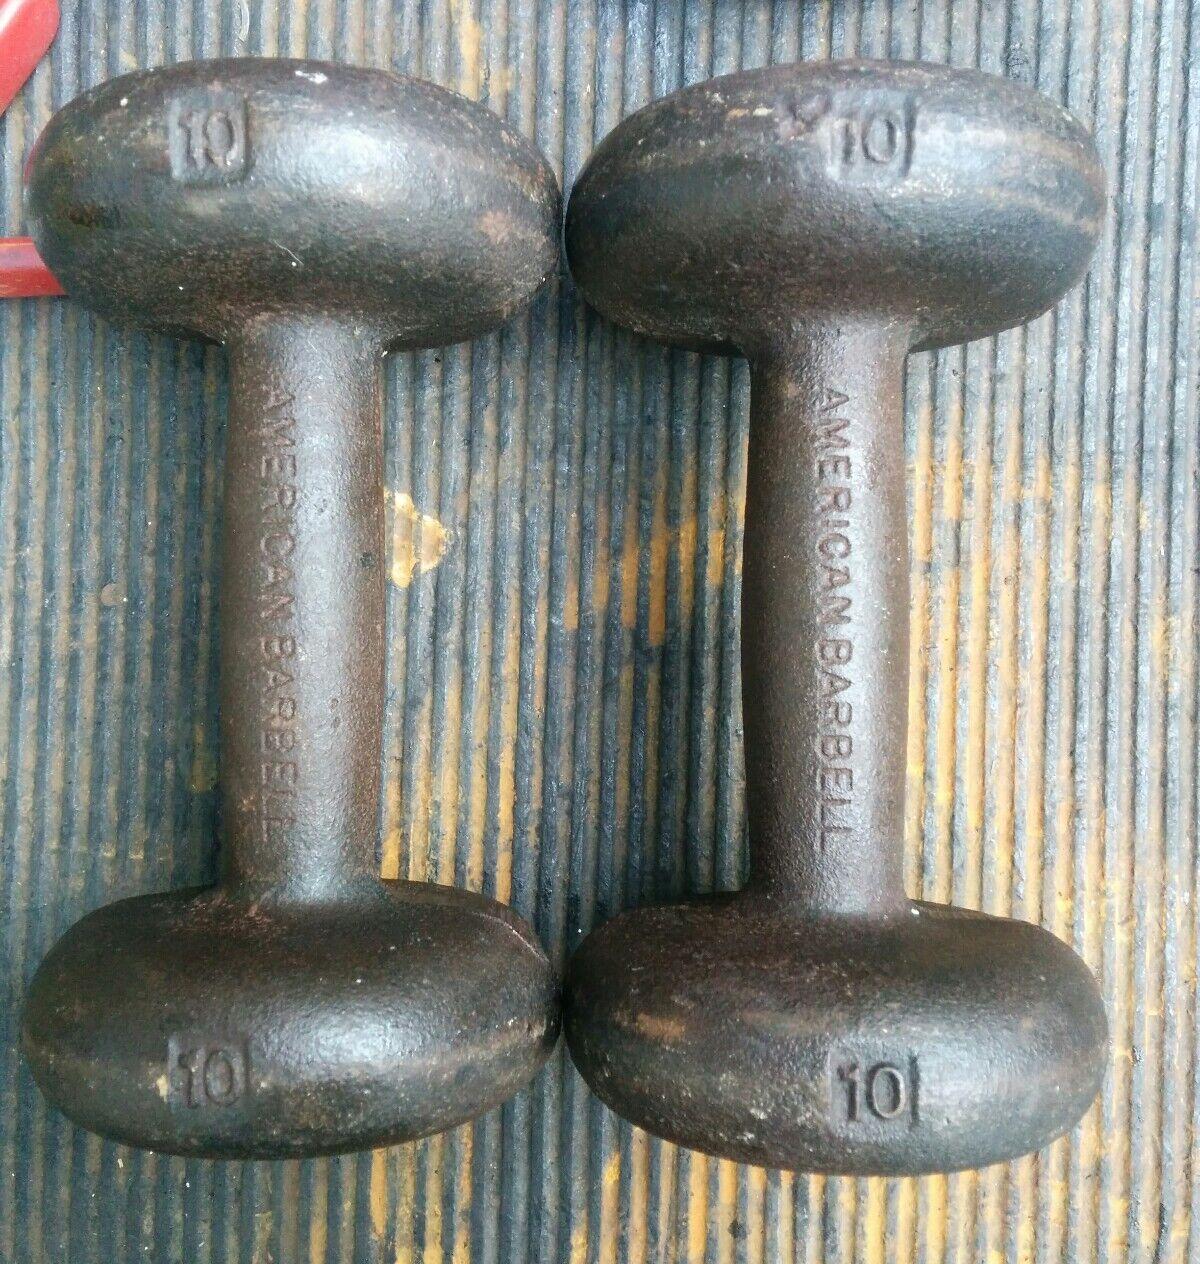 American Barbell 10 pound Pair Bun Dumbbell Rare Dumbell Globe 2x10 lbs